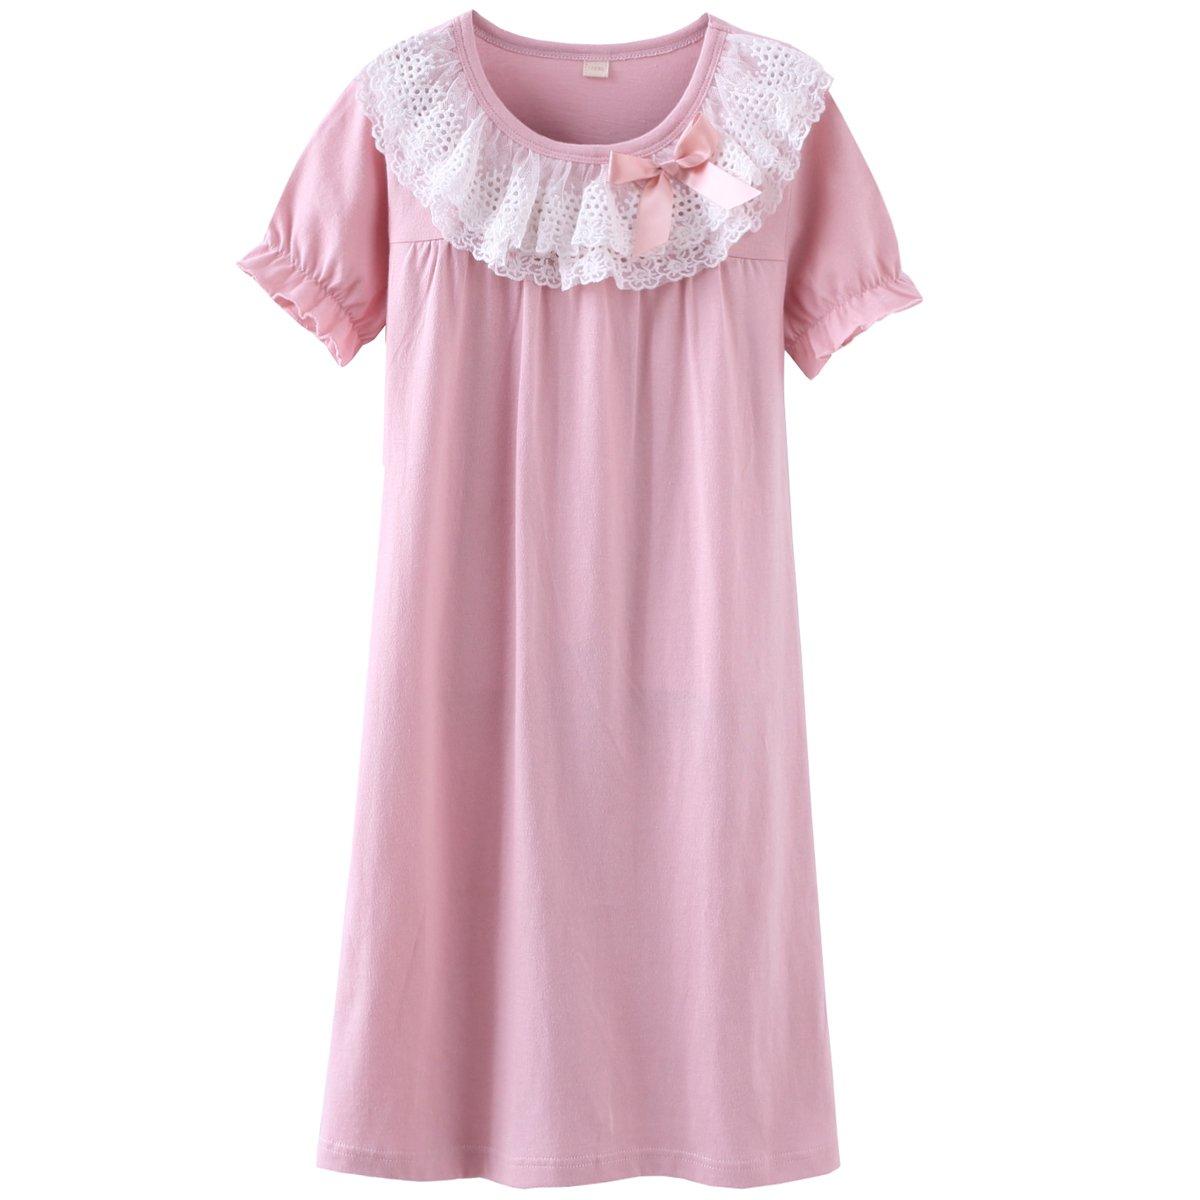 Amazon.com  DGAGA Little Girls Princess Nightgown Cotton Lace Bowknot  Sleepwear Nightdress  Clothing 54315820f